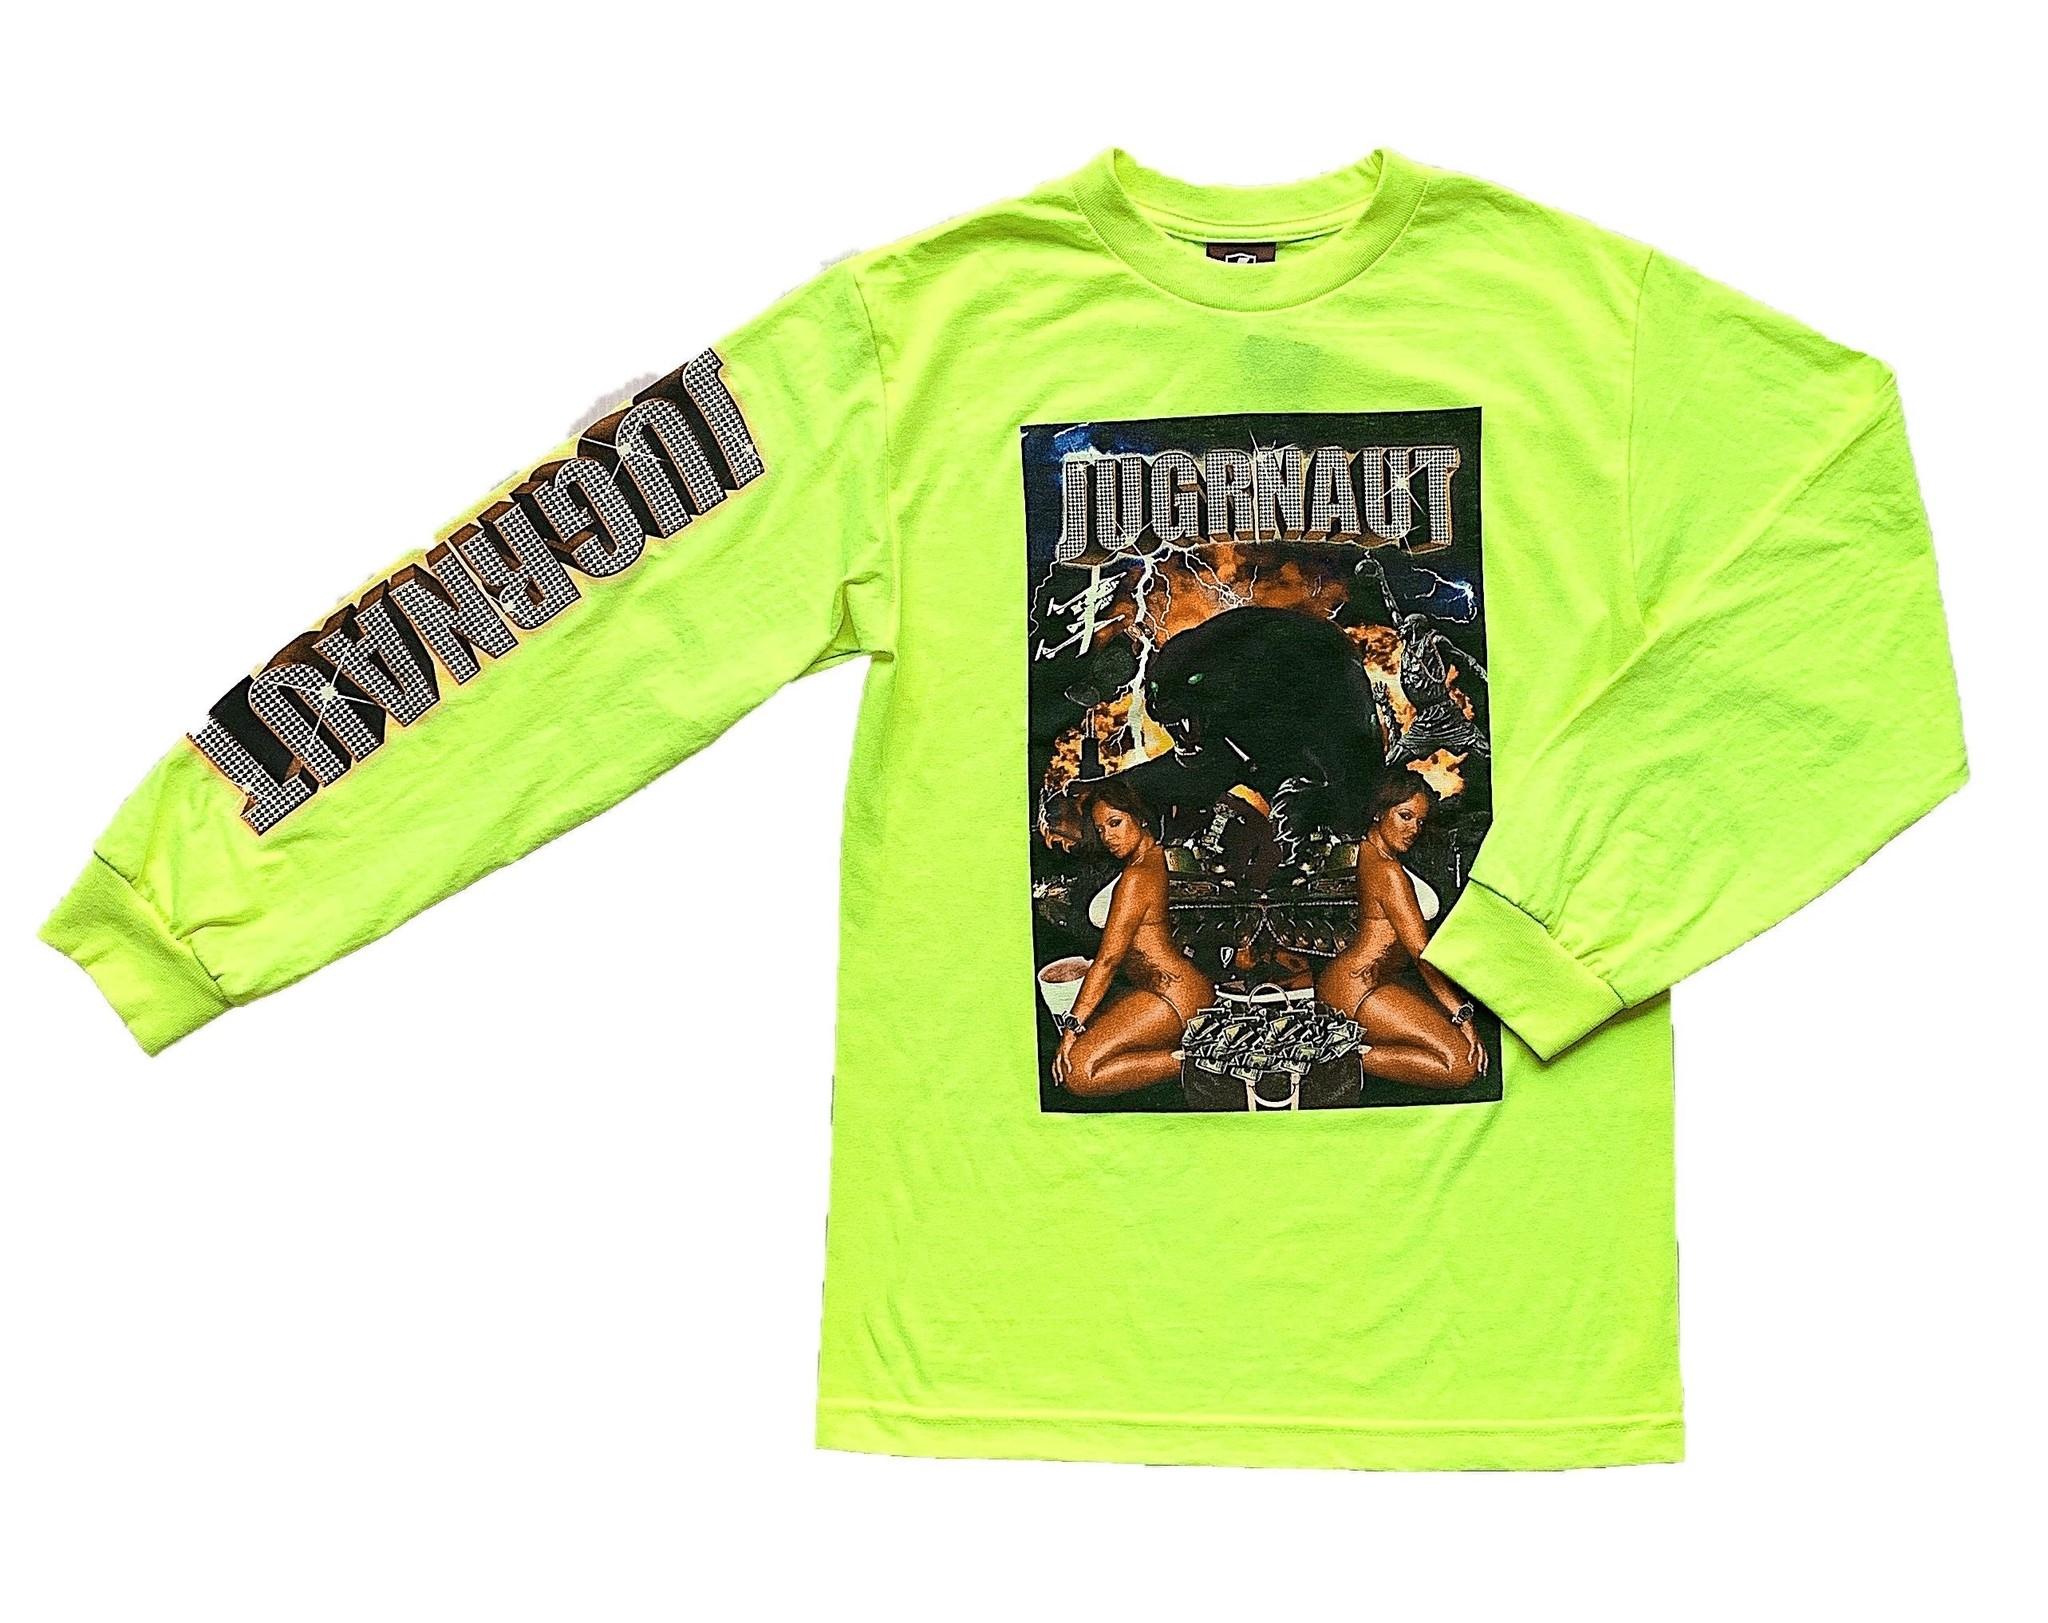 Jugrnaut Bout it L/S Safety Green